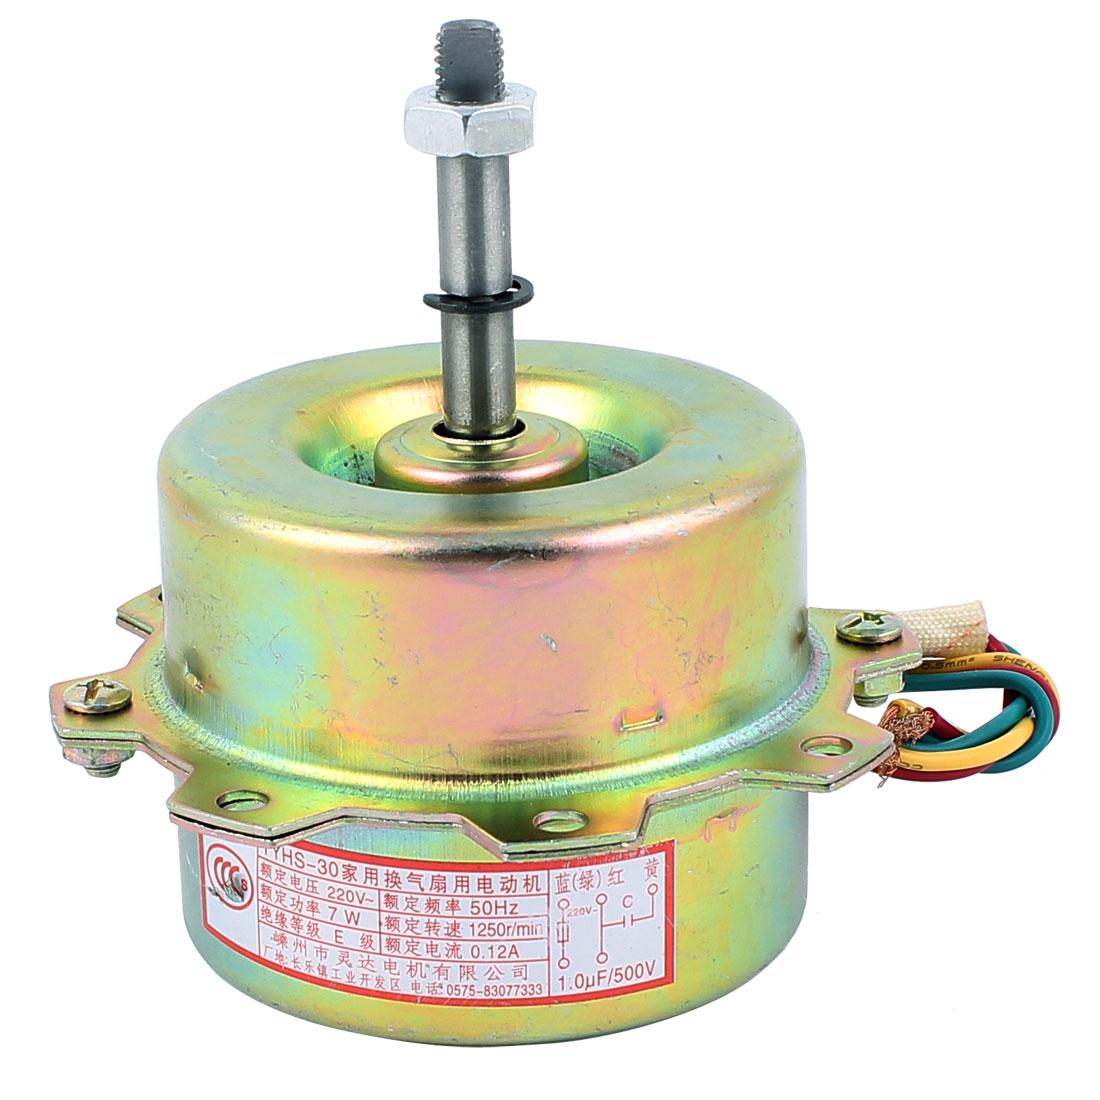 AC 220V 0.12A 7W 1250RPM 8mmx45mm Dual Bearing Ball Electric Ventilator Fan Motor